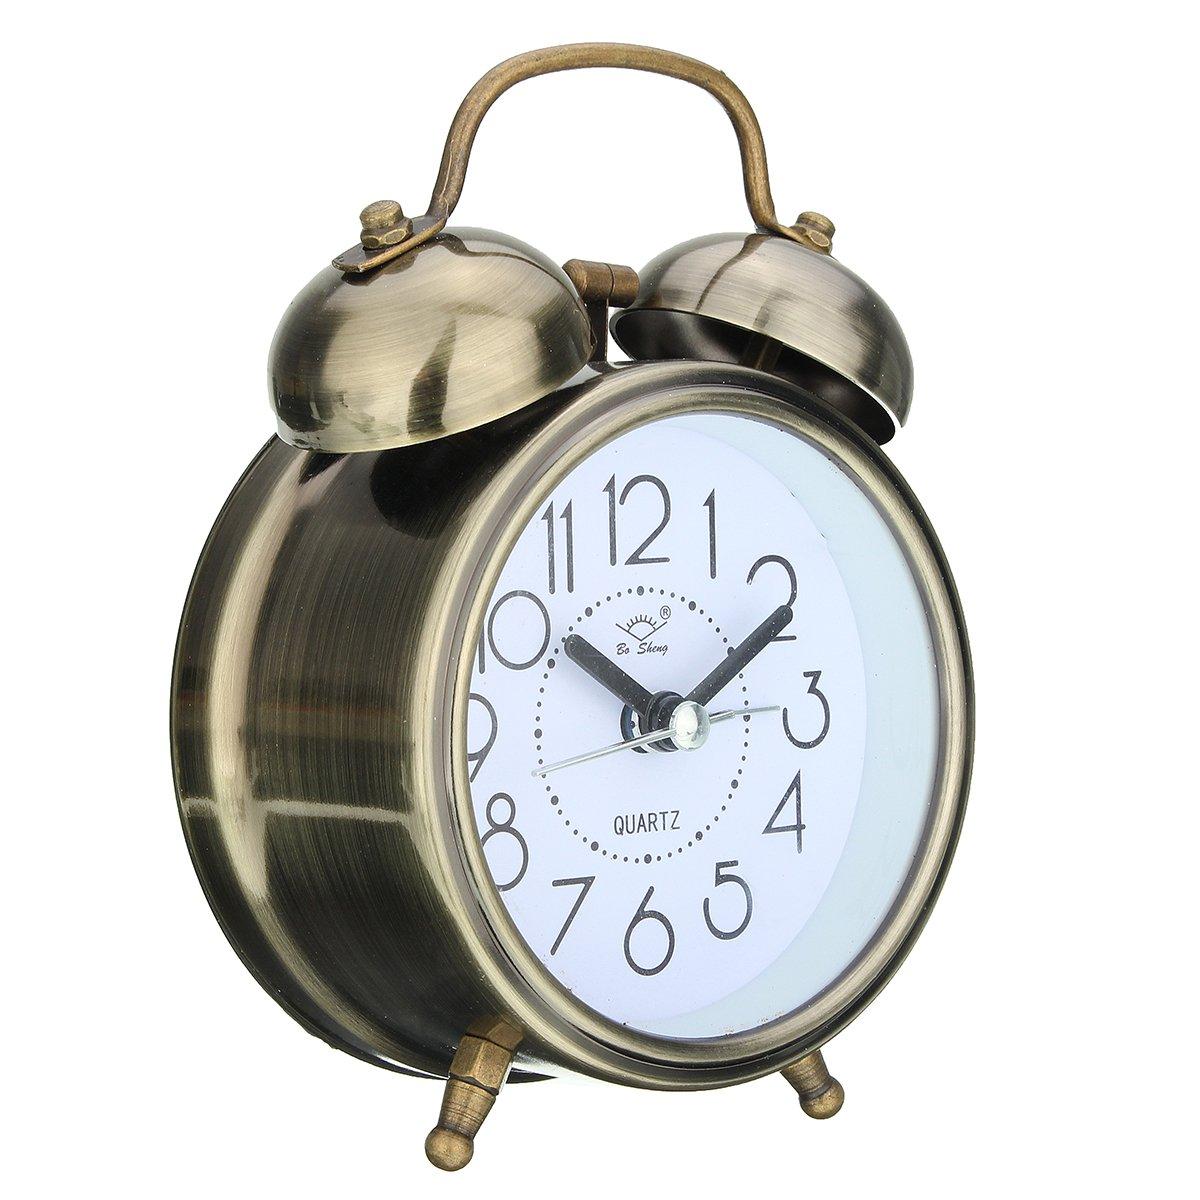 Prisma pro interior plat series amp tech series - Amazon Com Jeteven Vintage Silent Alarm Clock Loud Twin Bell Mute Alarm Clock Quartz Analog Retro Bedside And Desk Clock With Nightlight Bronze Home